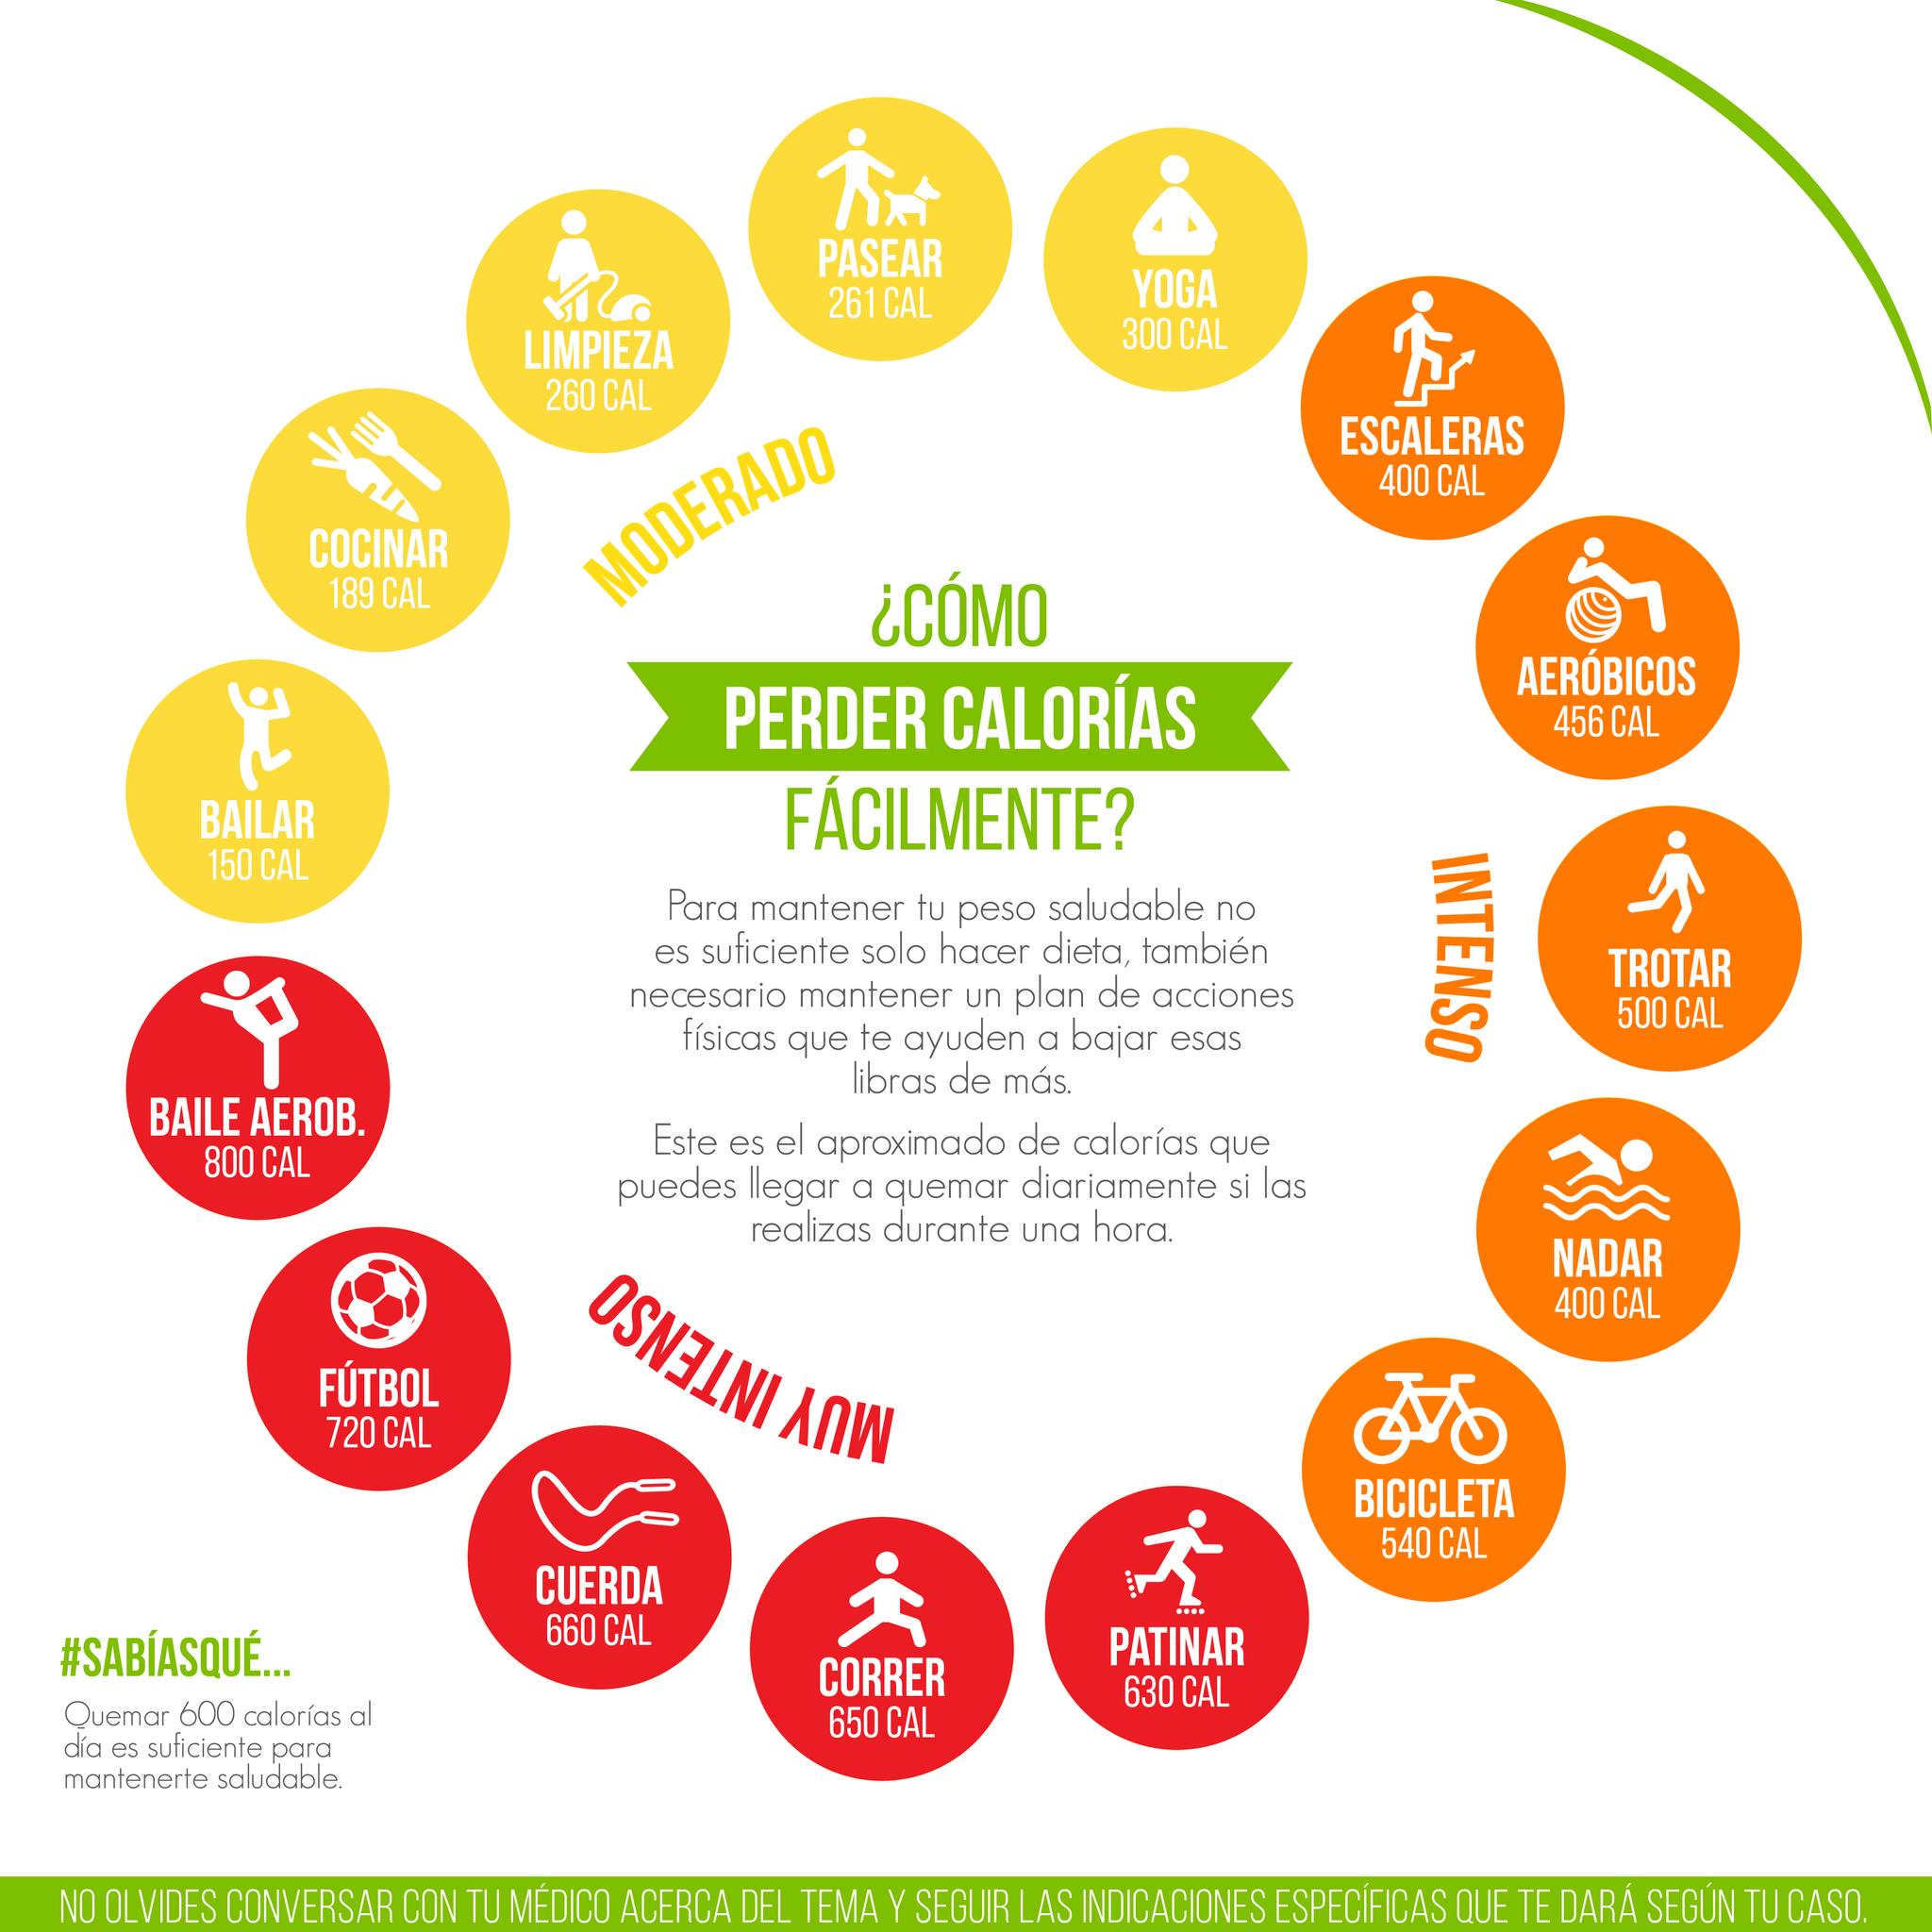 Consejos para perder calorías sin necesidad de gimnasio. Vía @Invdes https://t.co/1PGFSdpLpw